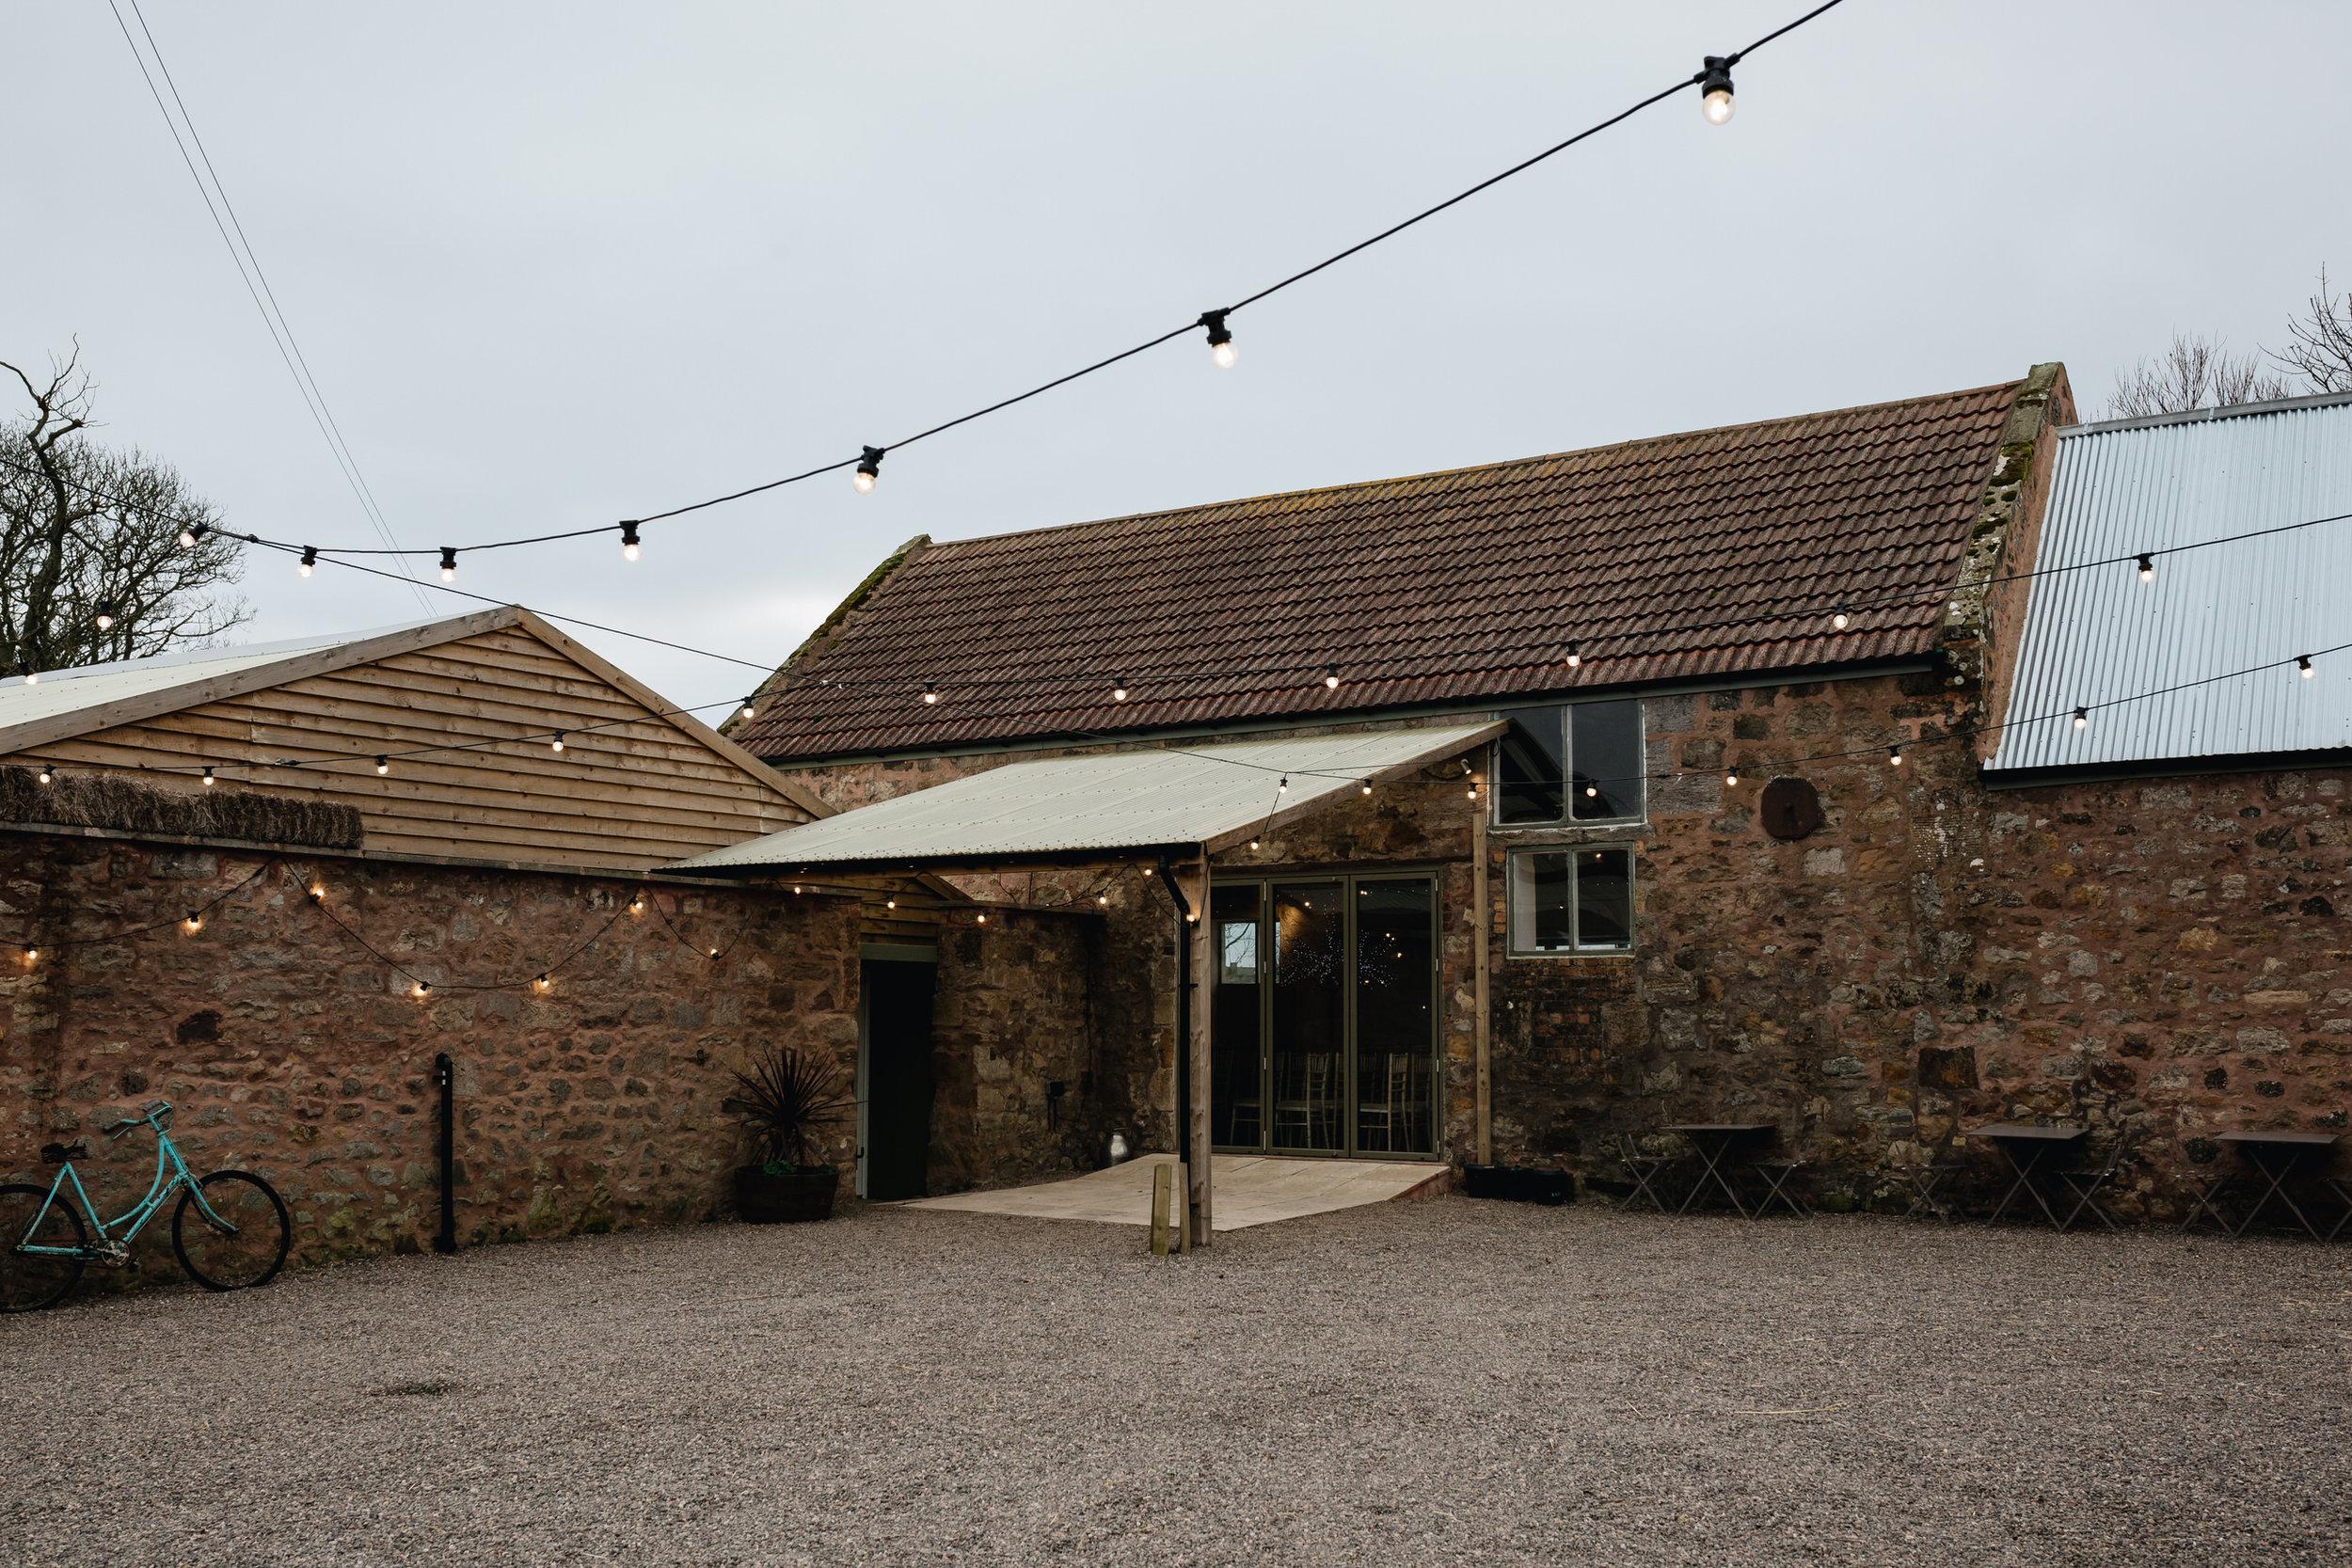 025-unusual-wedding-venues-scotland.JPG